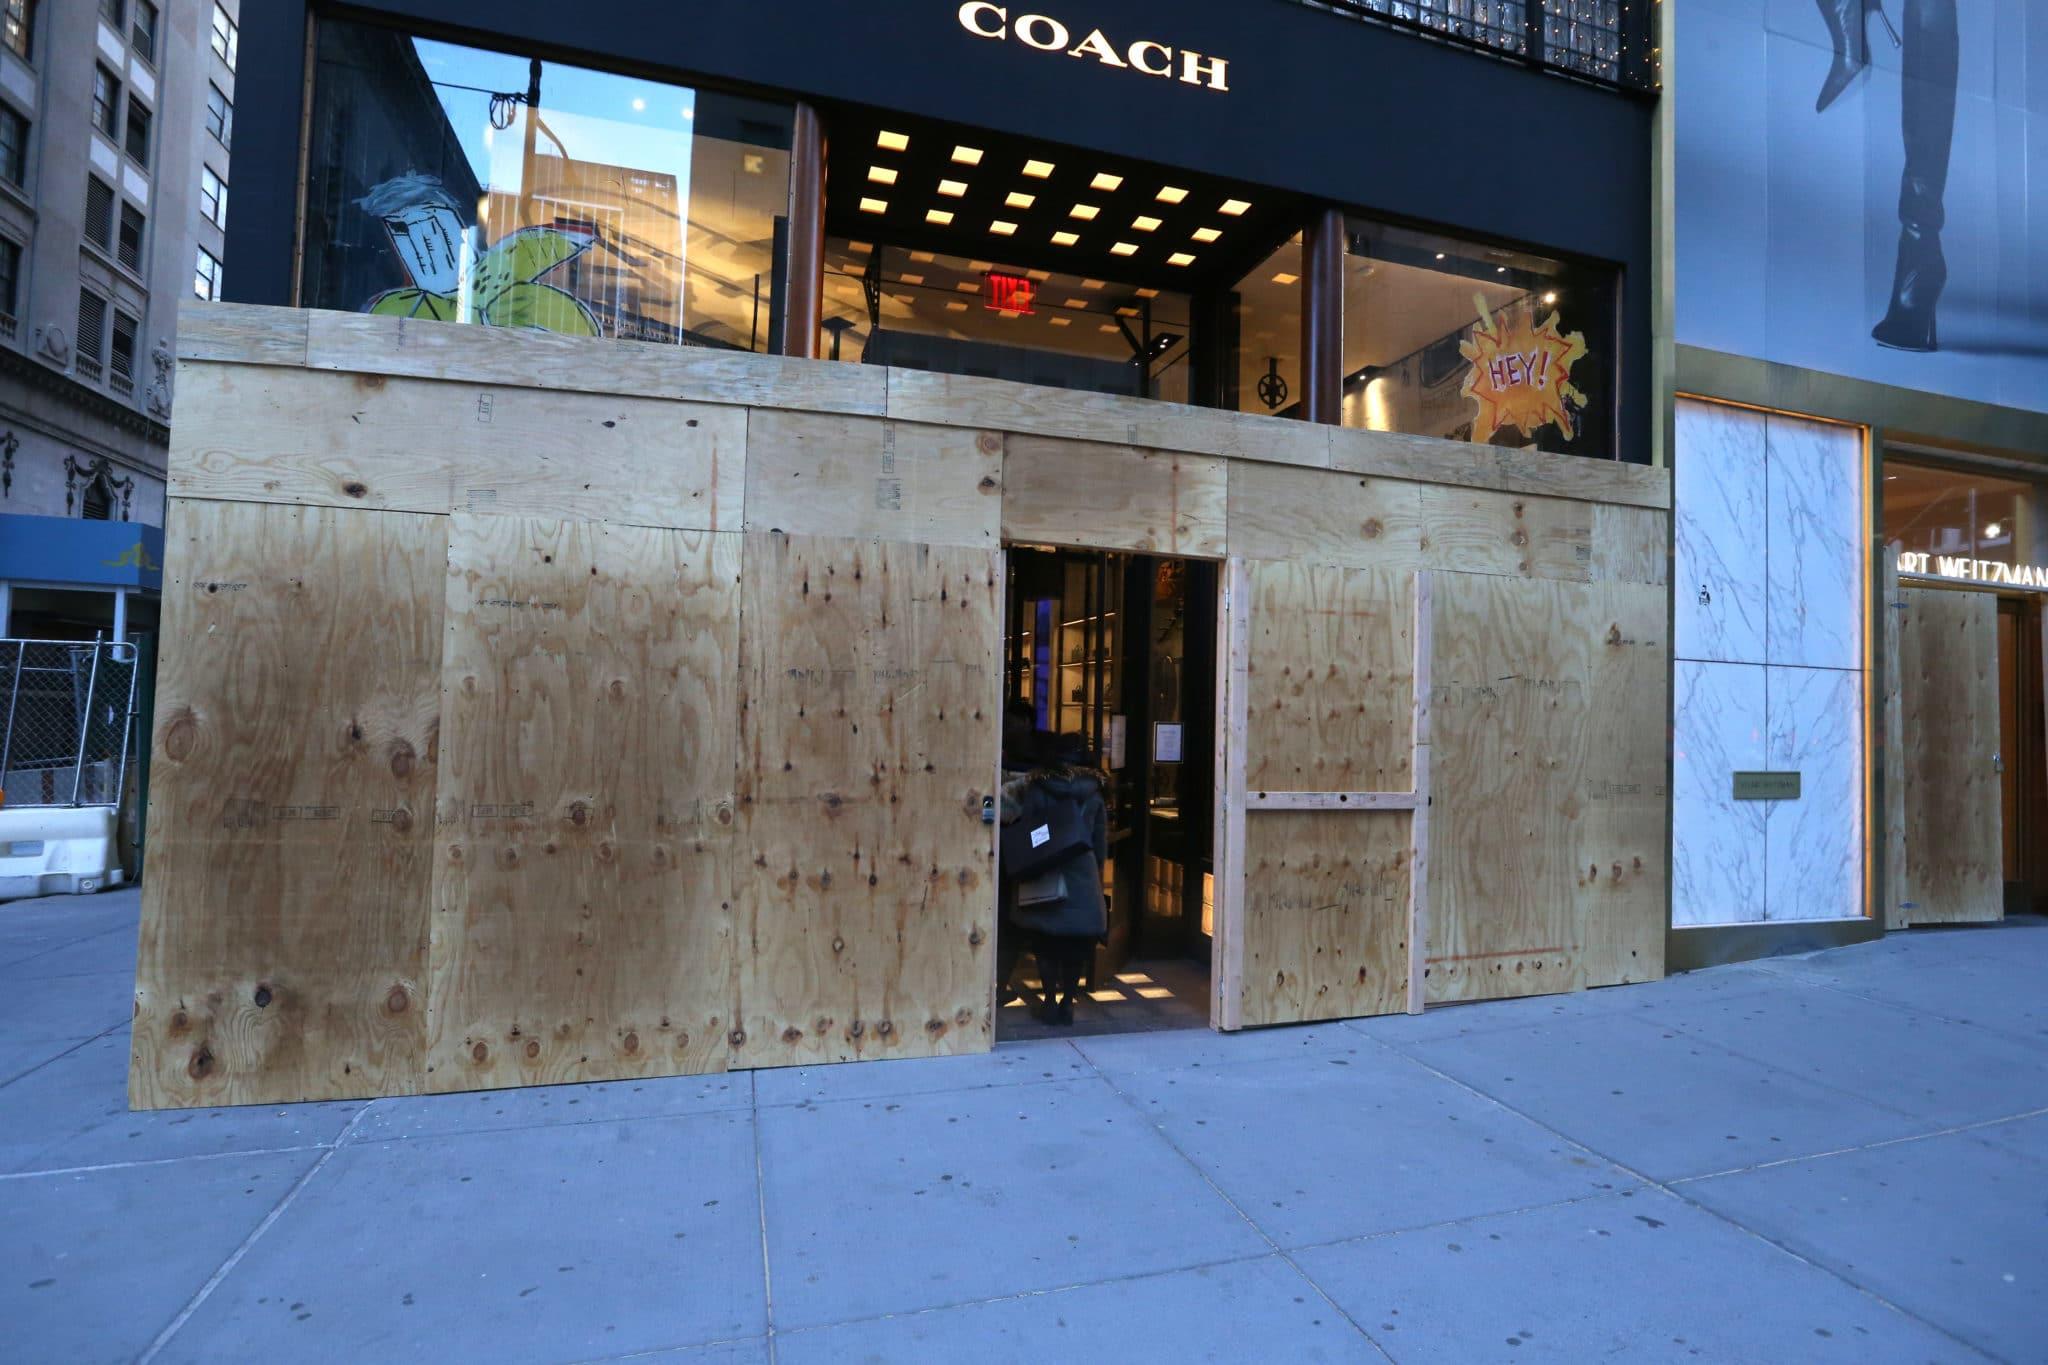 elezioni usa negozi barricati